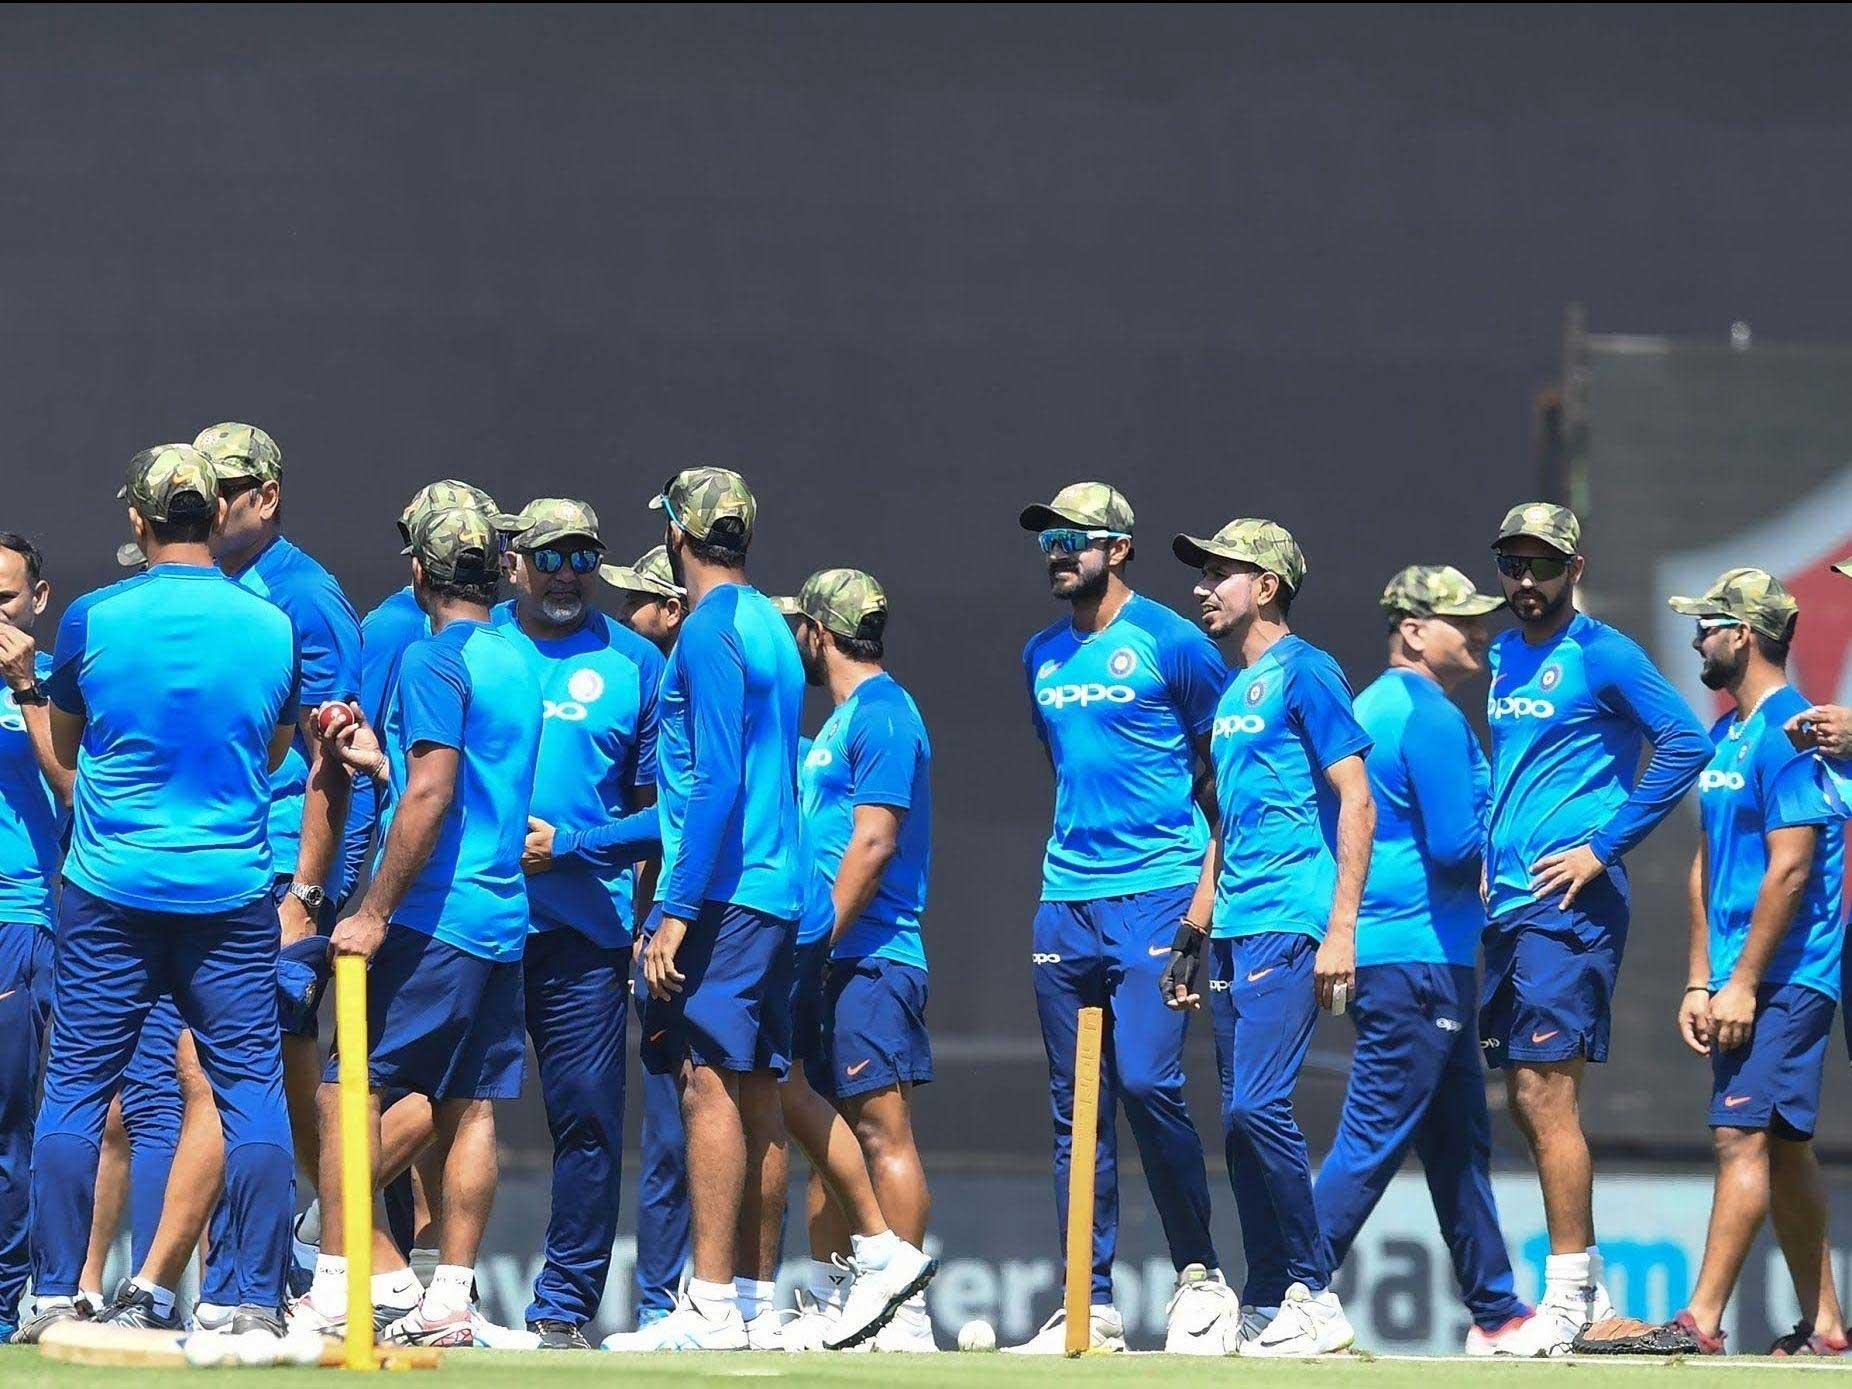 cricket7 - بھارتی کرکٹرز بھی جنگی جنون میں مبتلا، فوجی ٹوپیاں پہن لیں